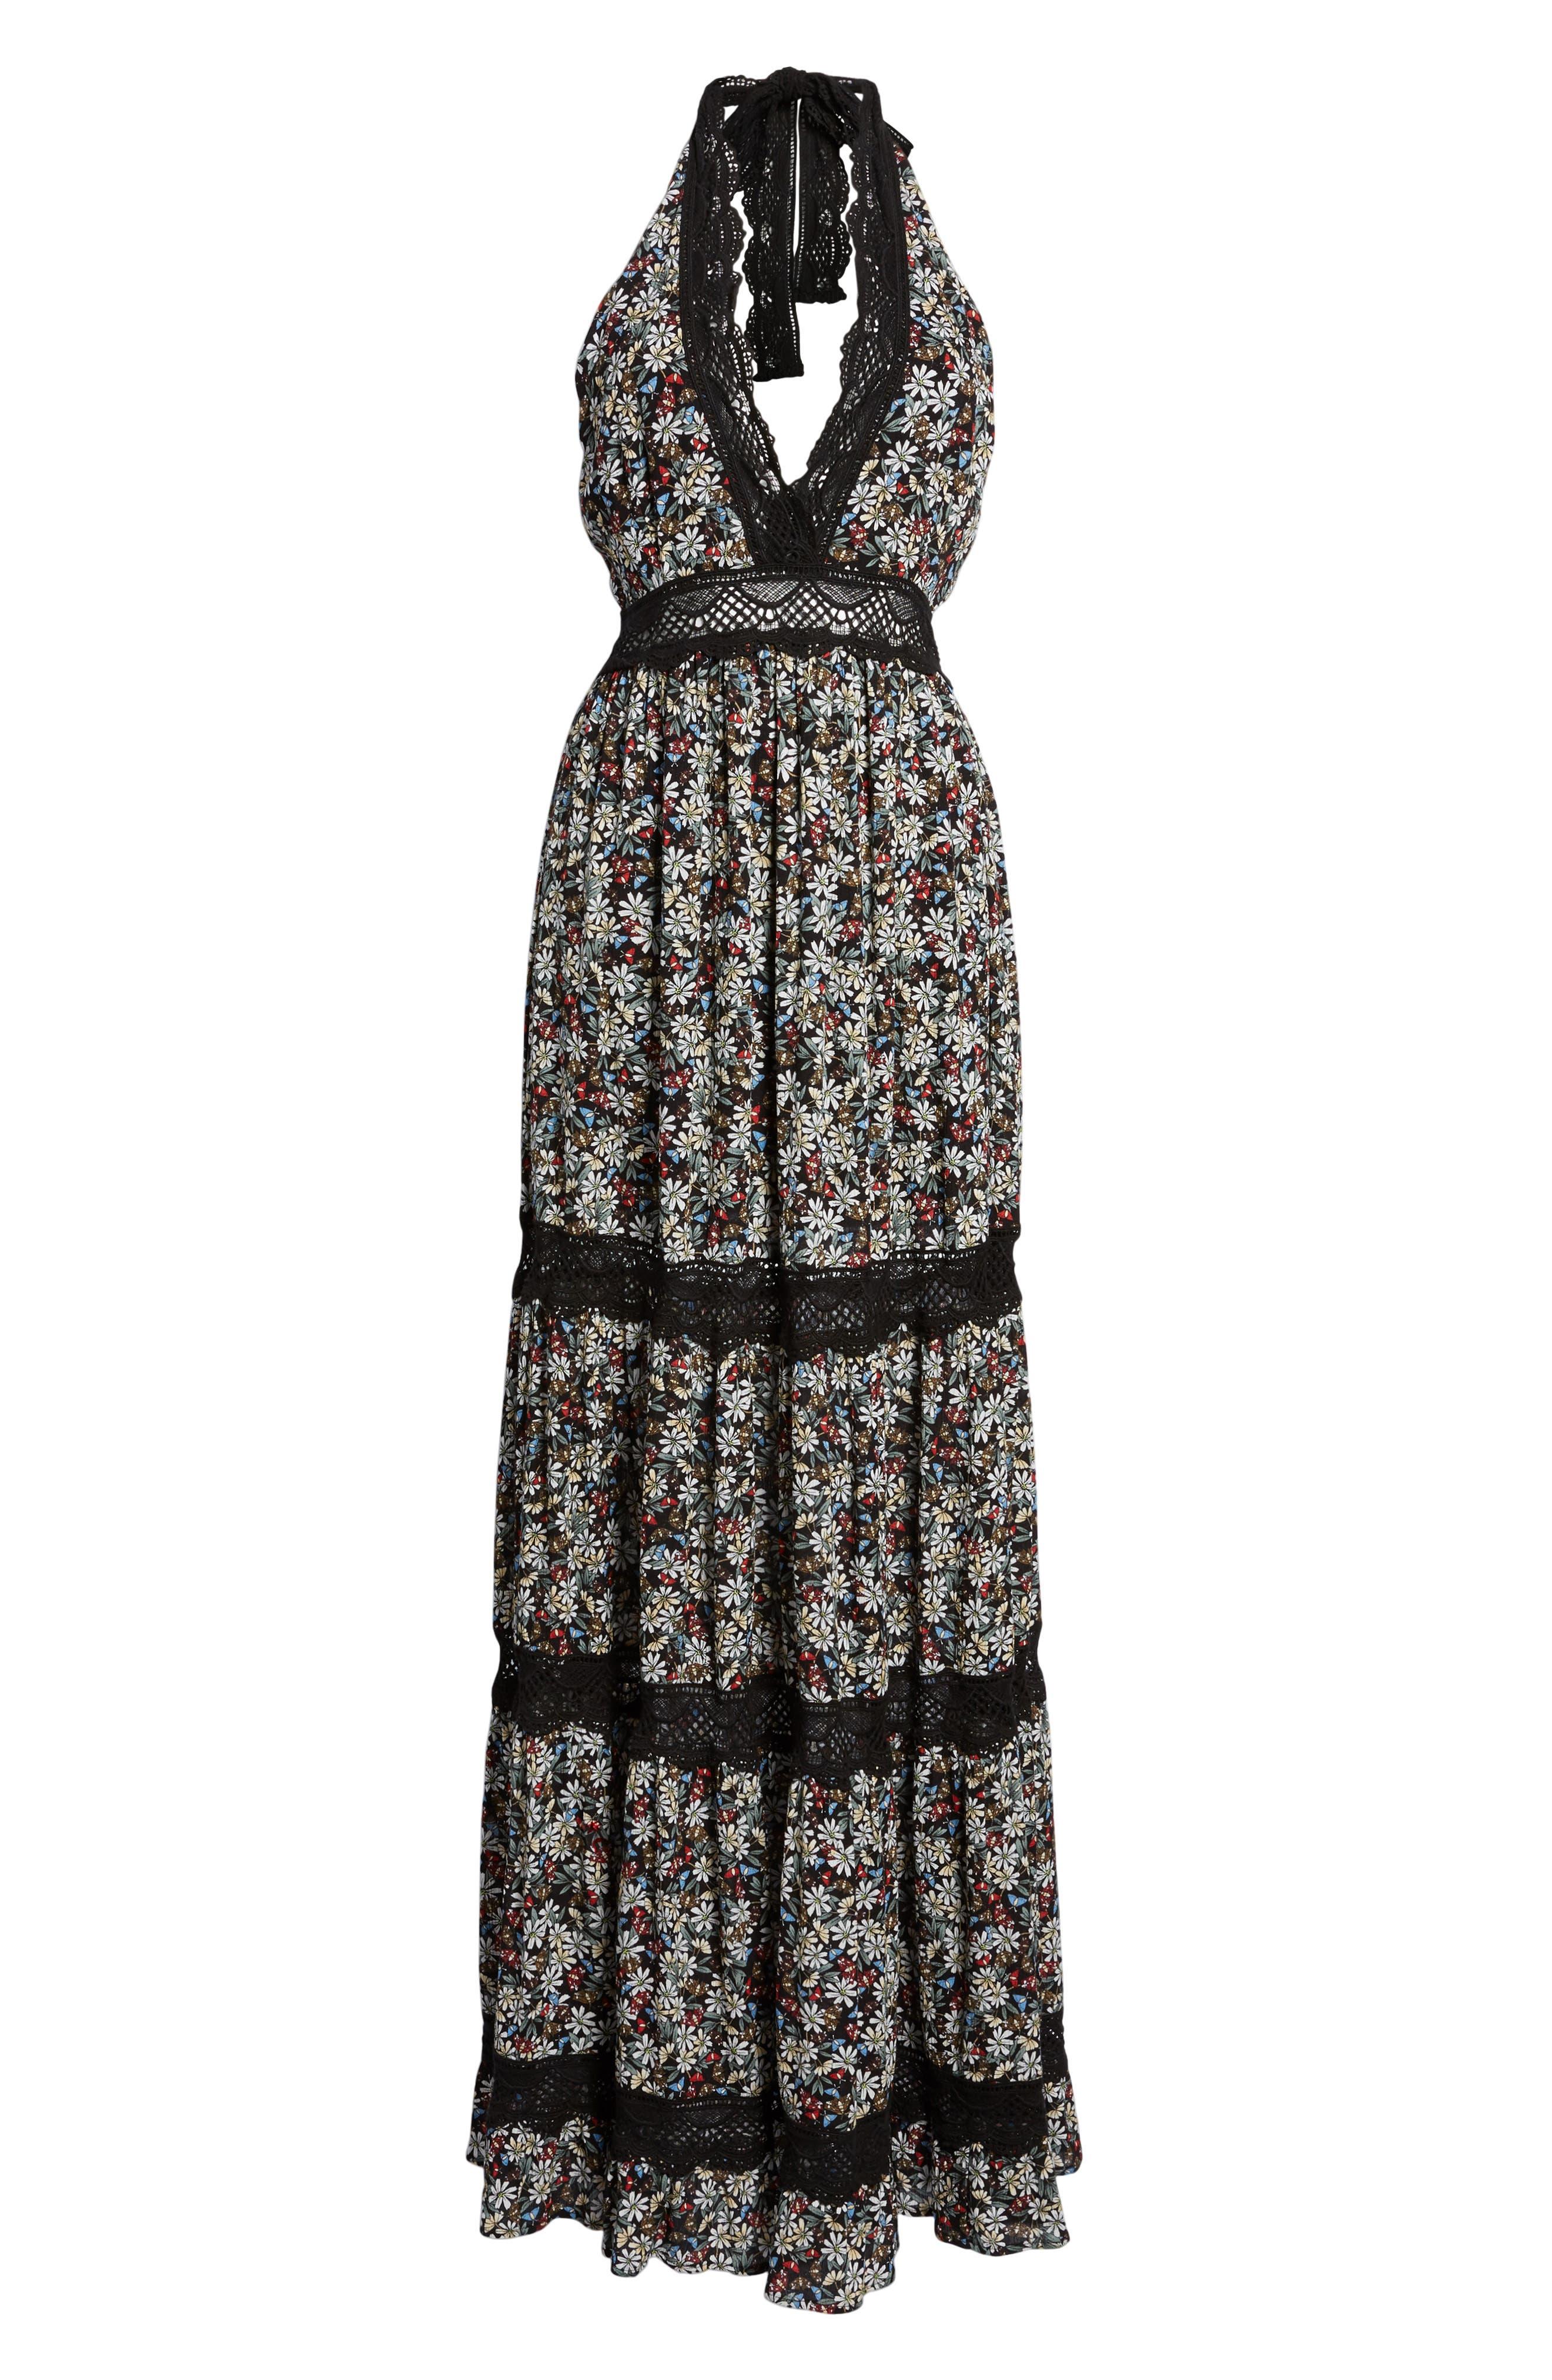 Flora Halter Neck Maxi Dress,                             Alternate thumbnail 7, color,                             Multi Black